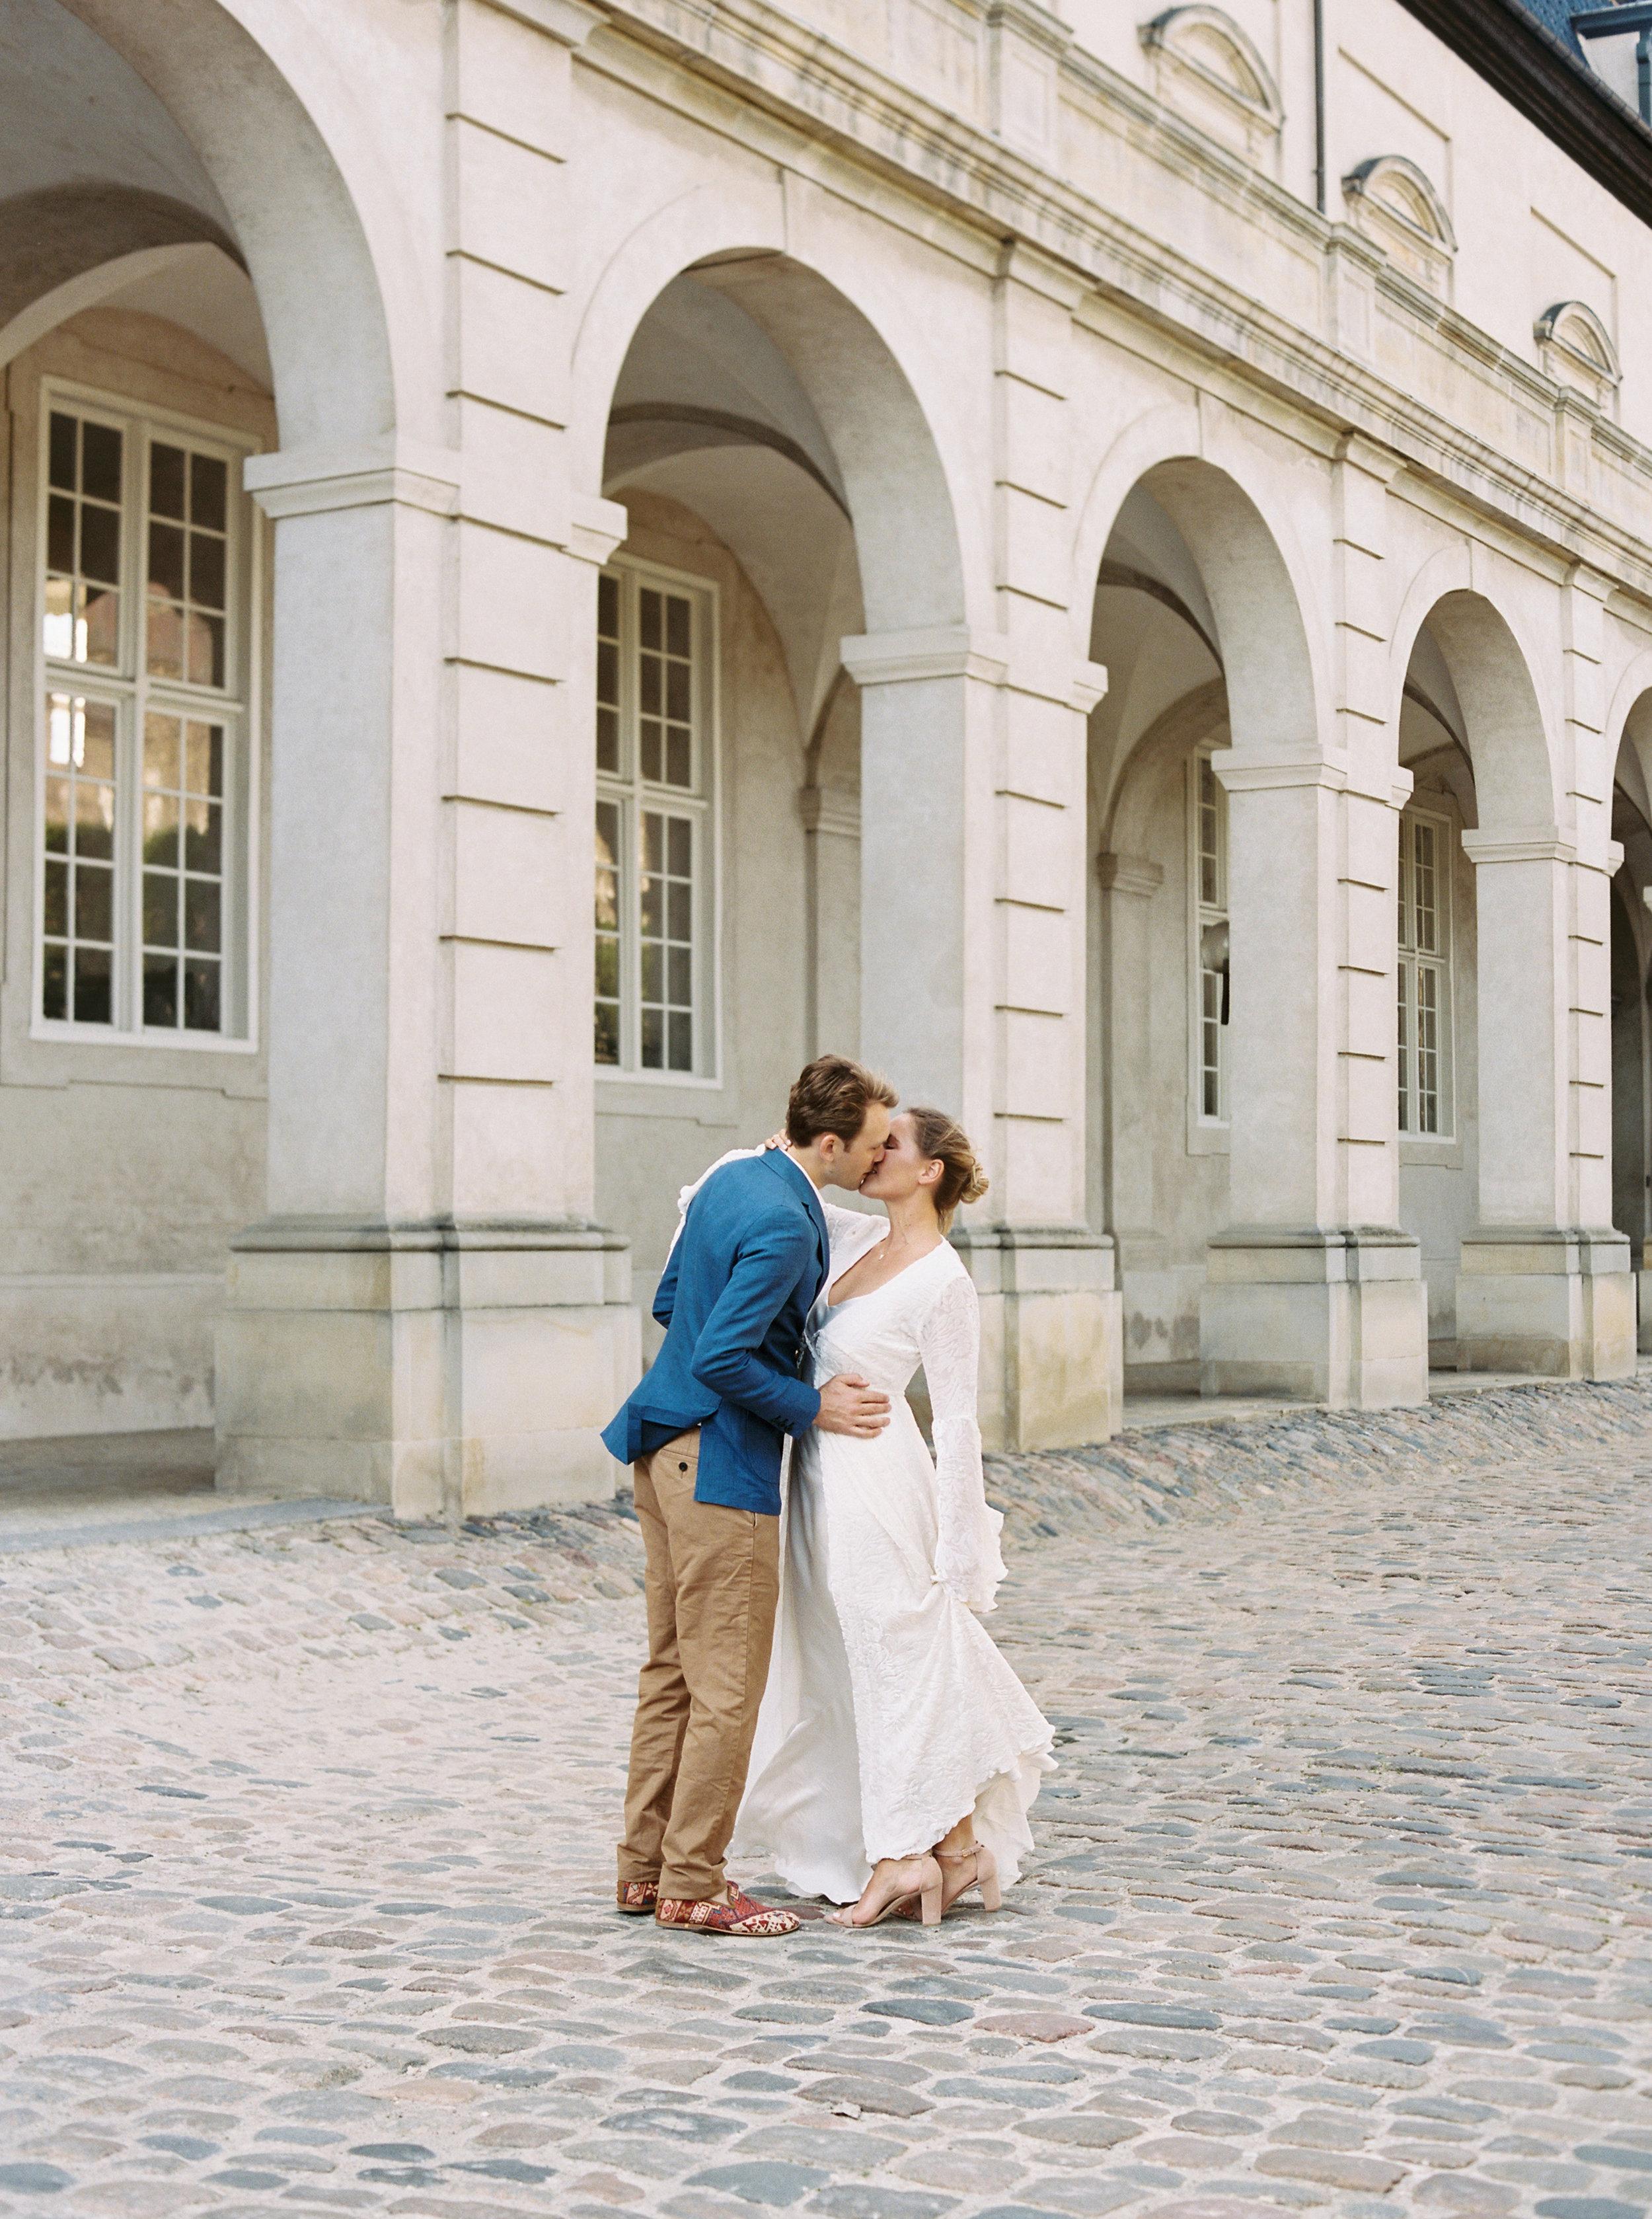 Kyle John l Fine Art Wedding Photography l Chicago, Copenhagen, California, New York, Destination l Blog l Alexis and Zach_Copenhagen Part 2_15